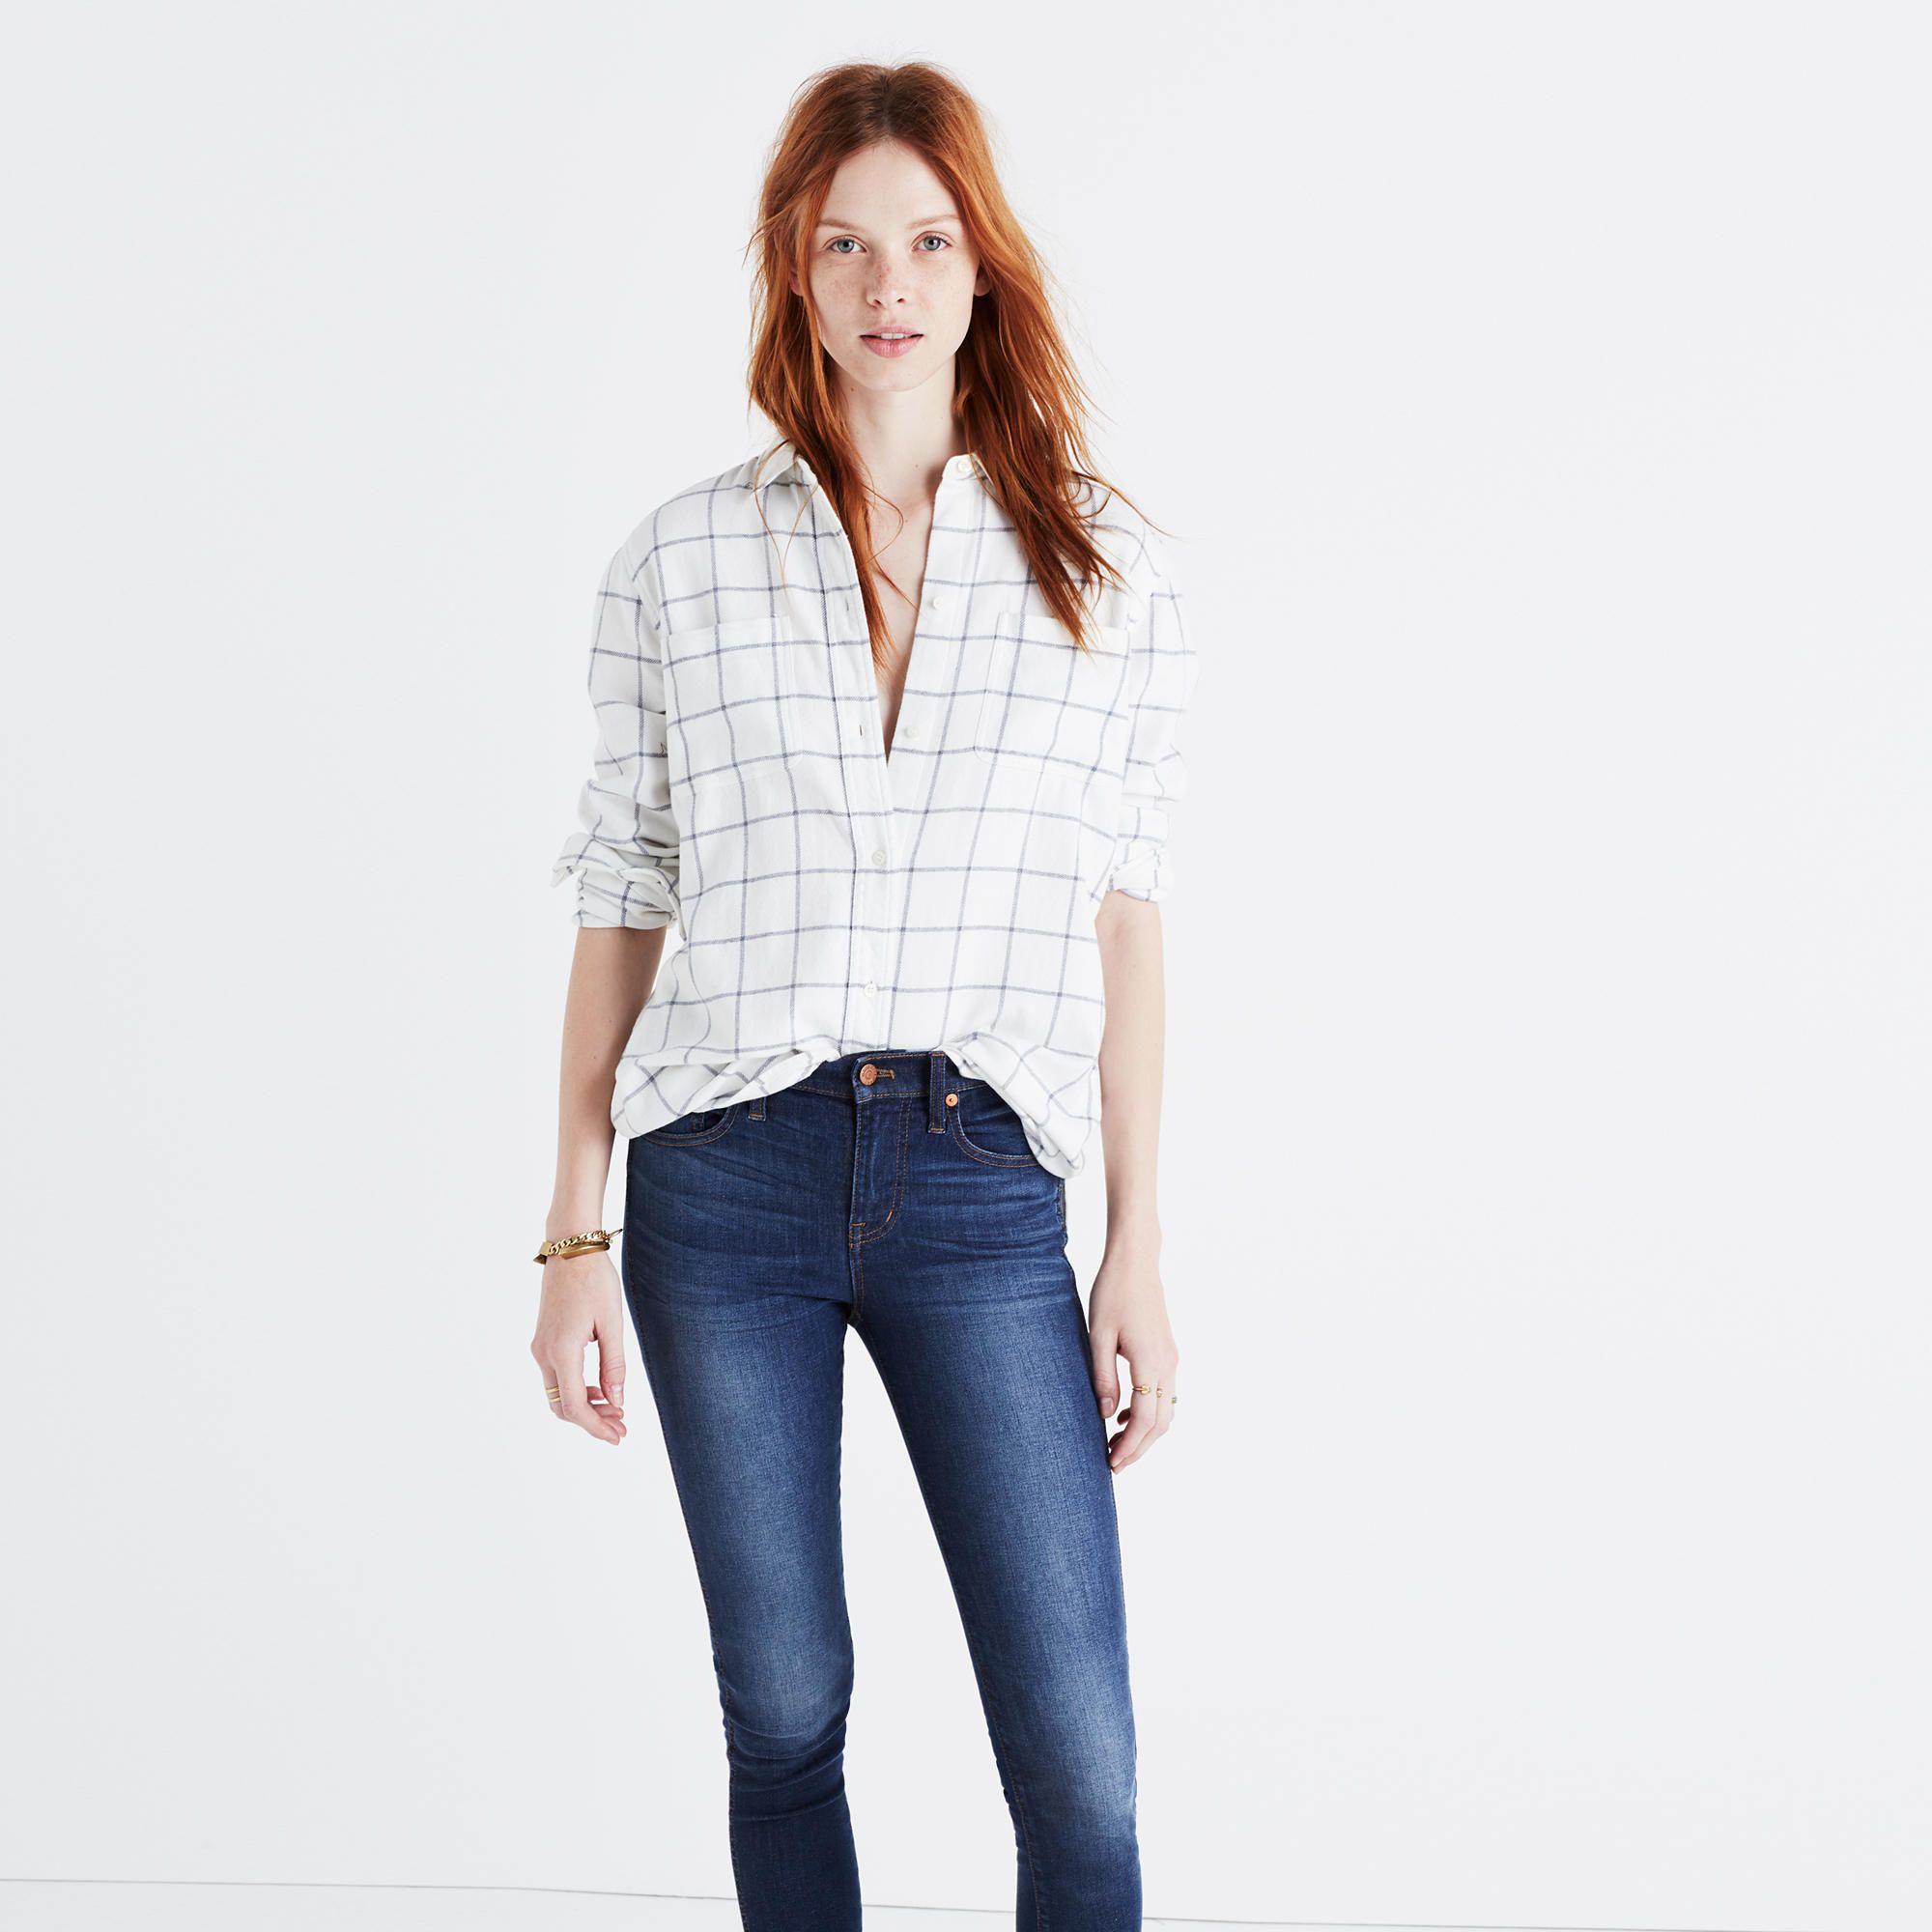 Flannel Classic Ex-Boyfriend Shirt in Windowpane. Flannel  ShirtsFlannelsLadies StyleBoyfriend ShirtShirts & TopsDenimAttitudeWomen's  DressesPlaid